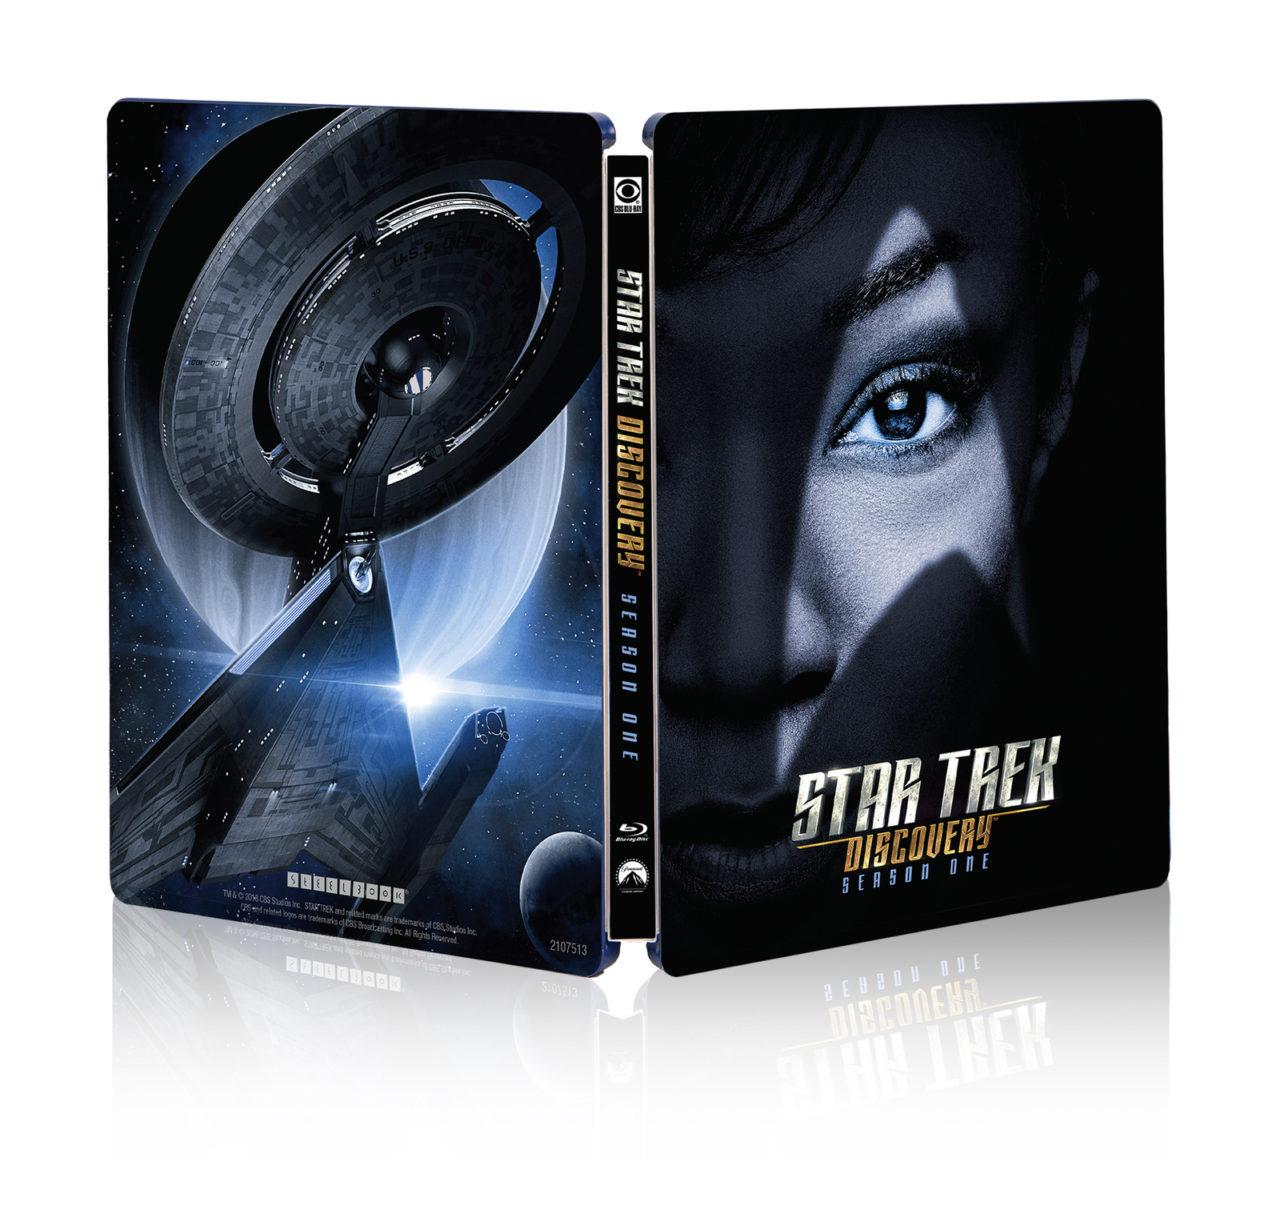 Star Trek Discovery Steelbook Coverart